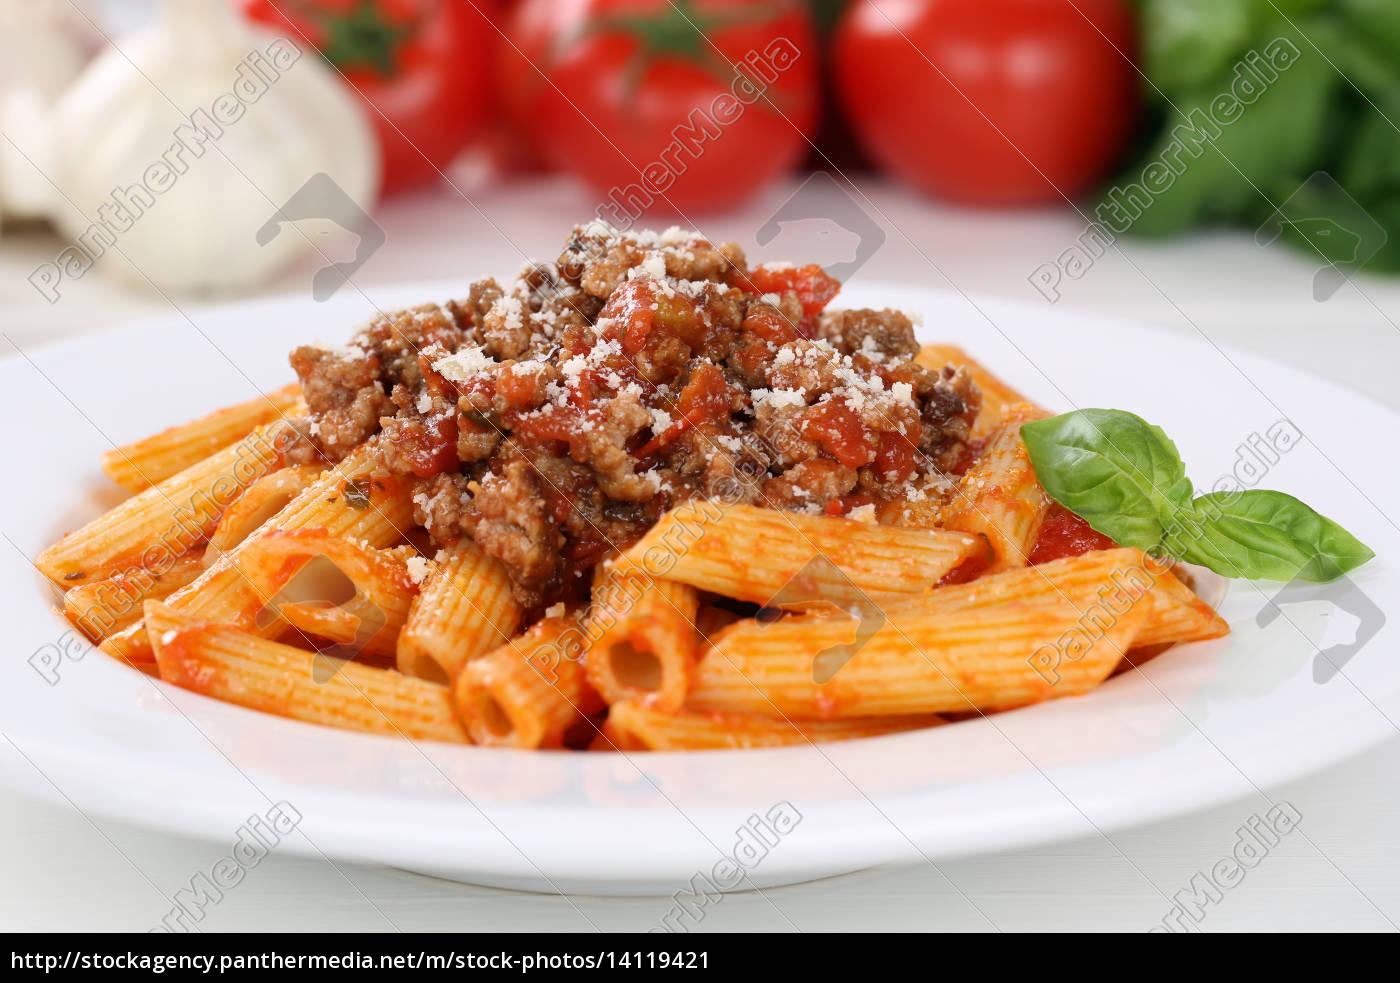 italienische nudeln pasta mit bolognese sauce gericht lizenzfreies bild 14119421. Black Bedroom Furniture Sets. Home Design Ideas